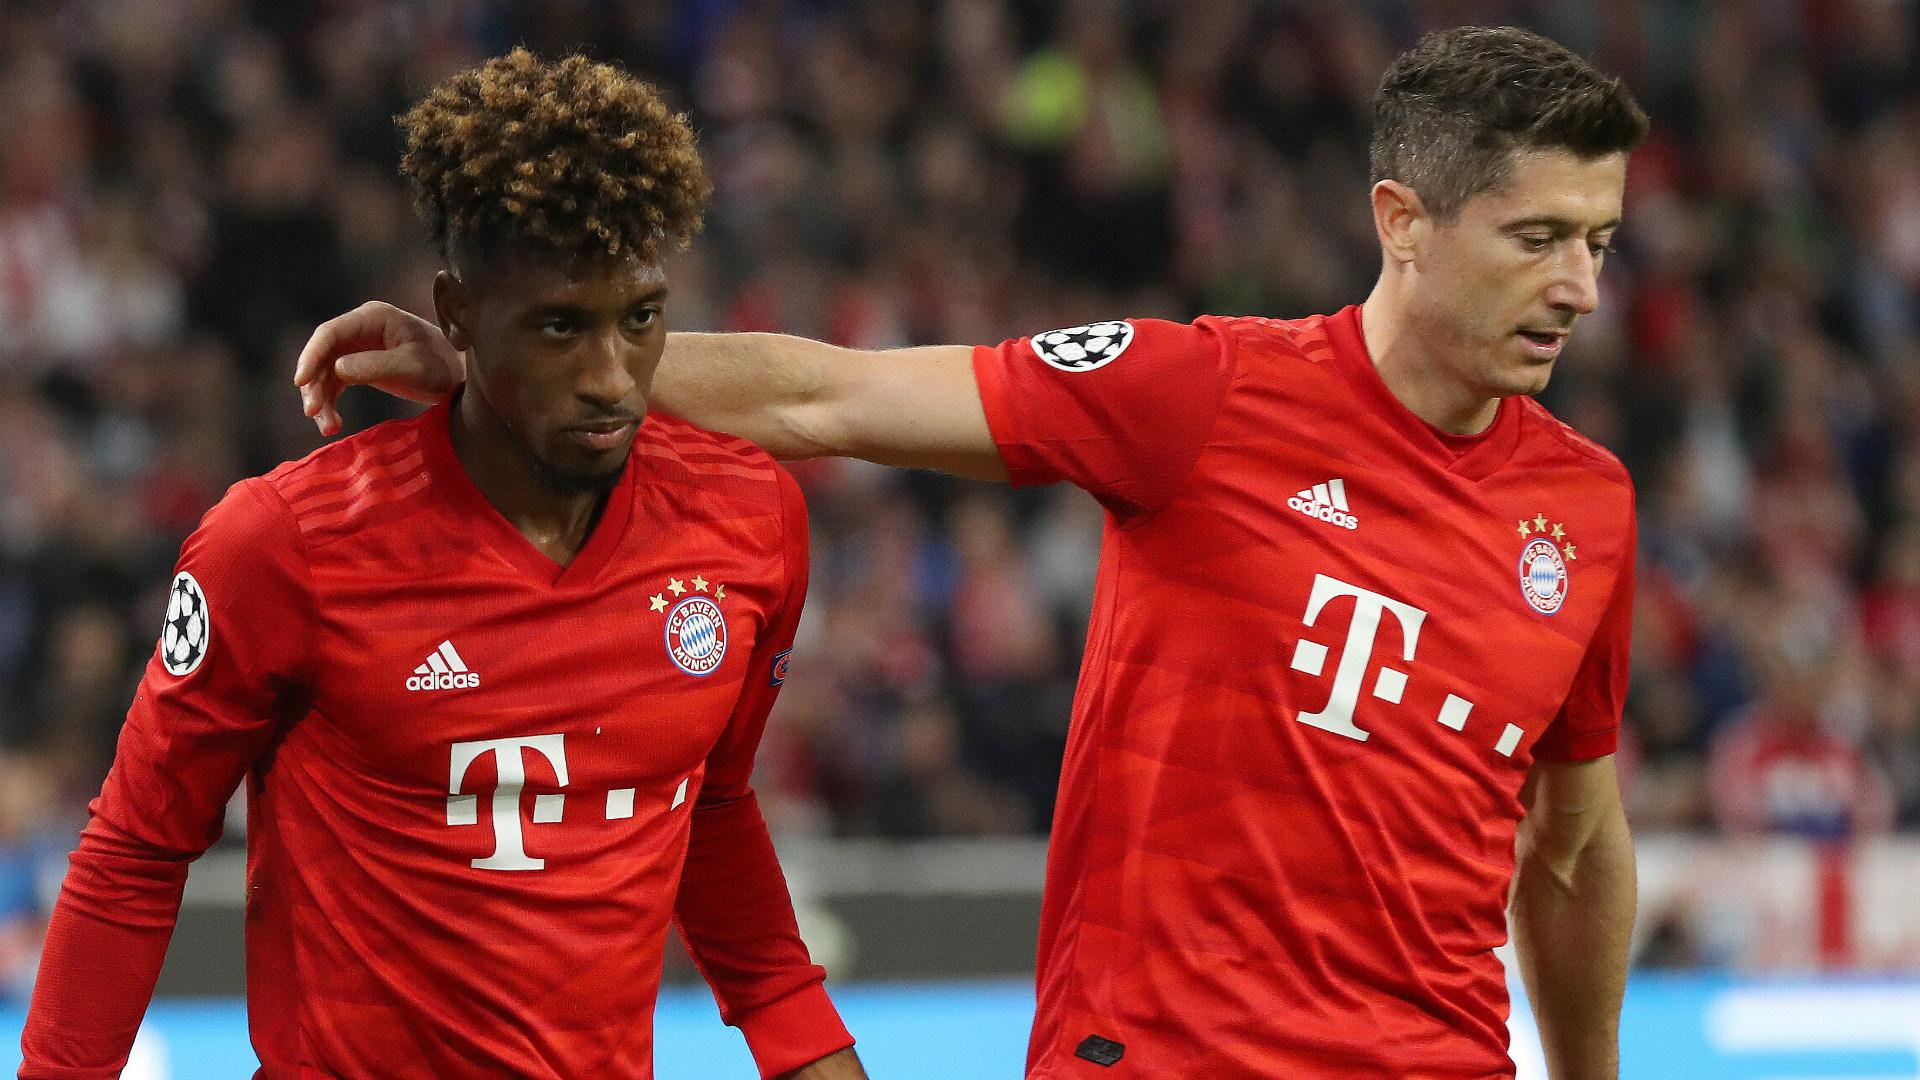 Kingsley Coman Bayern Munich 2019-20